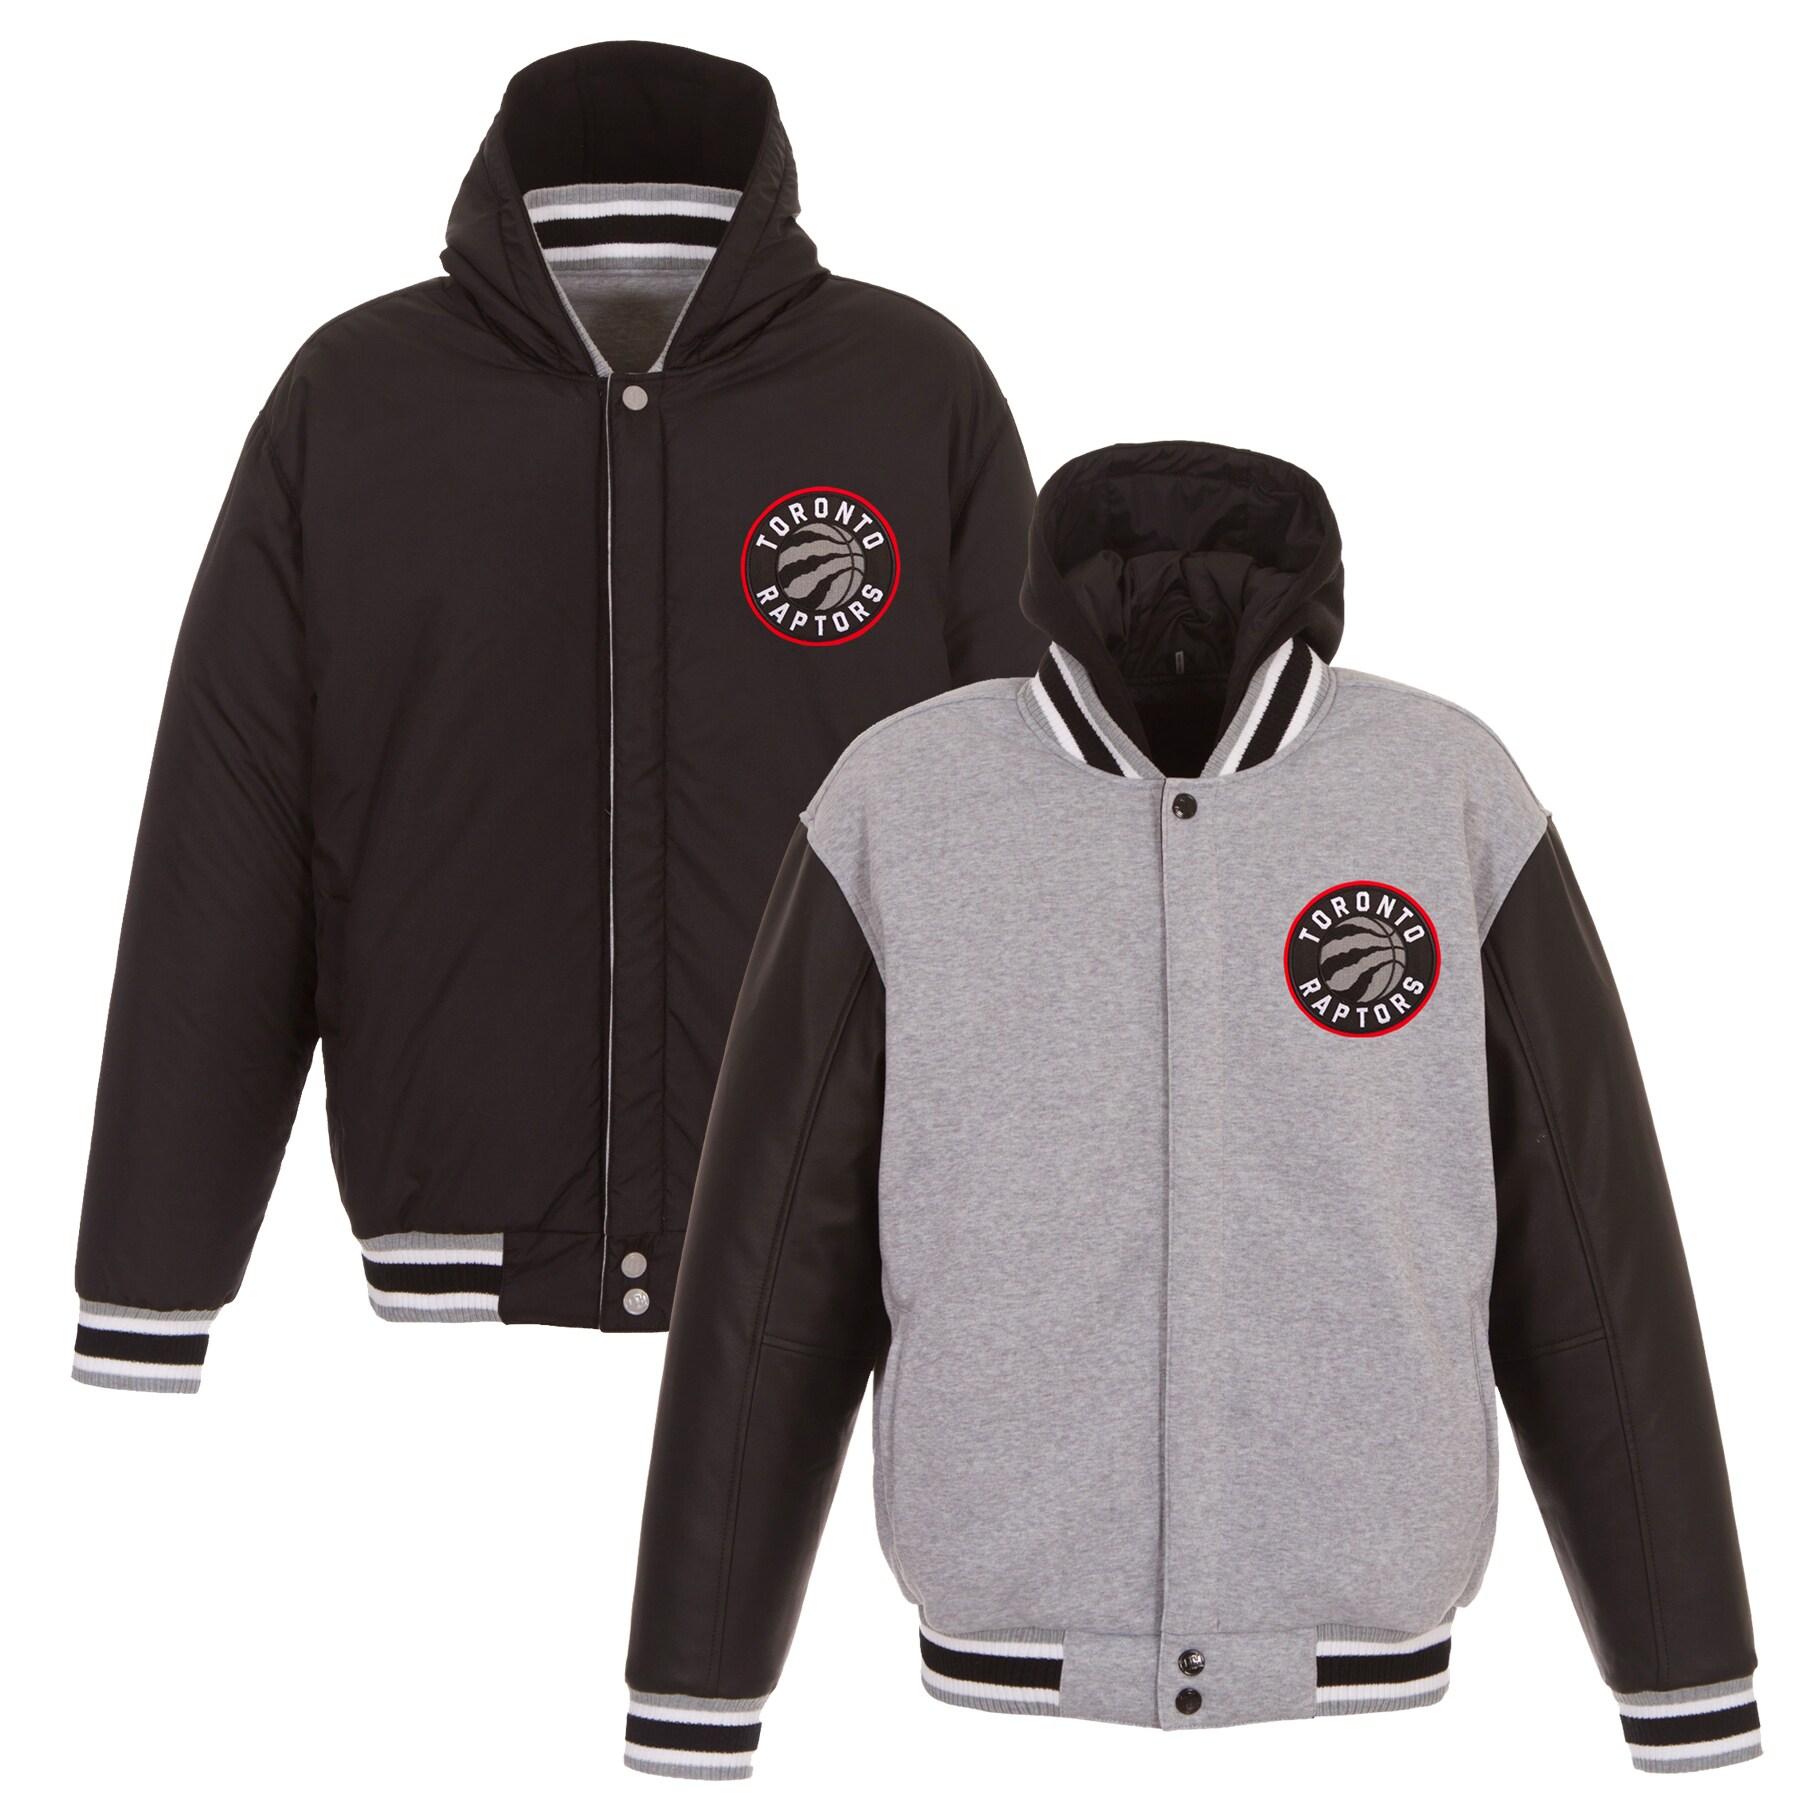 Toronto Raptors JH Design Embroidered Logo Reversible Hooded Fleece Full-Snap Jacket - Gray/Black